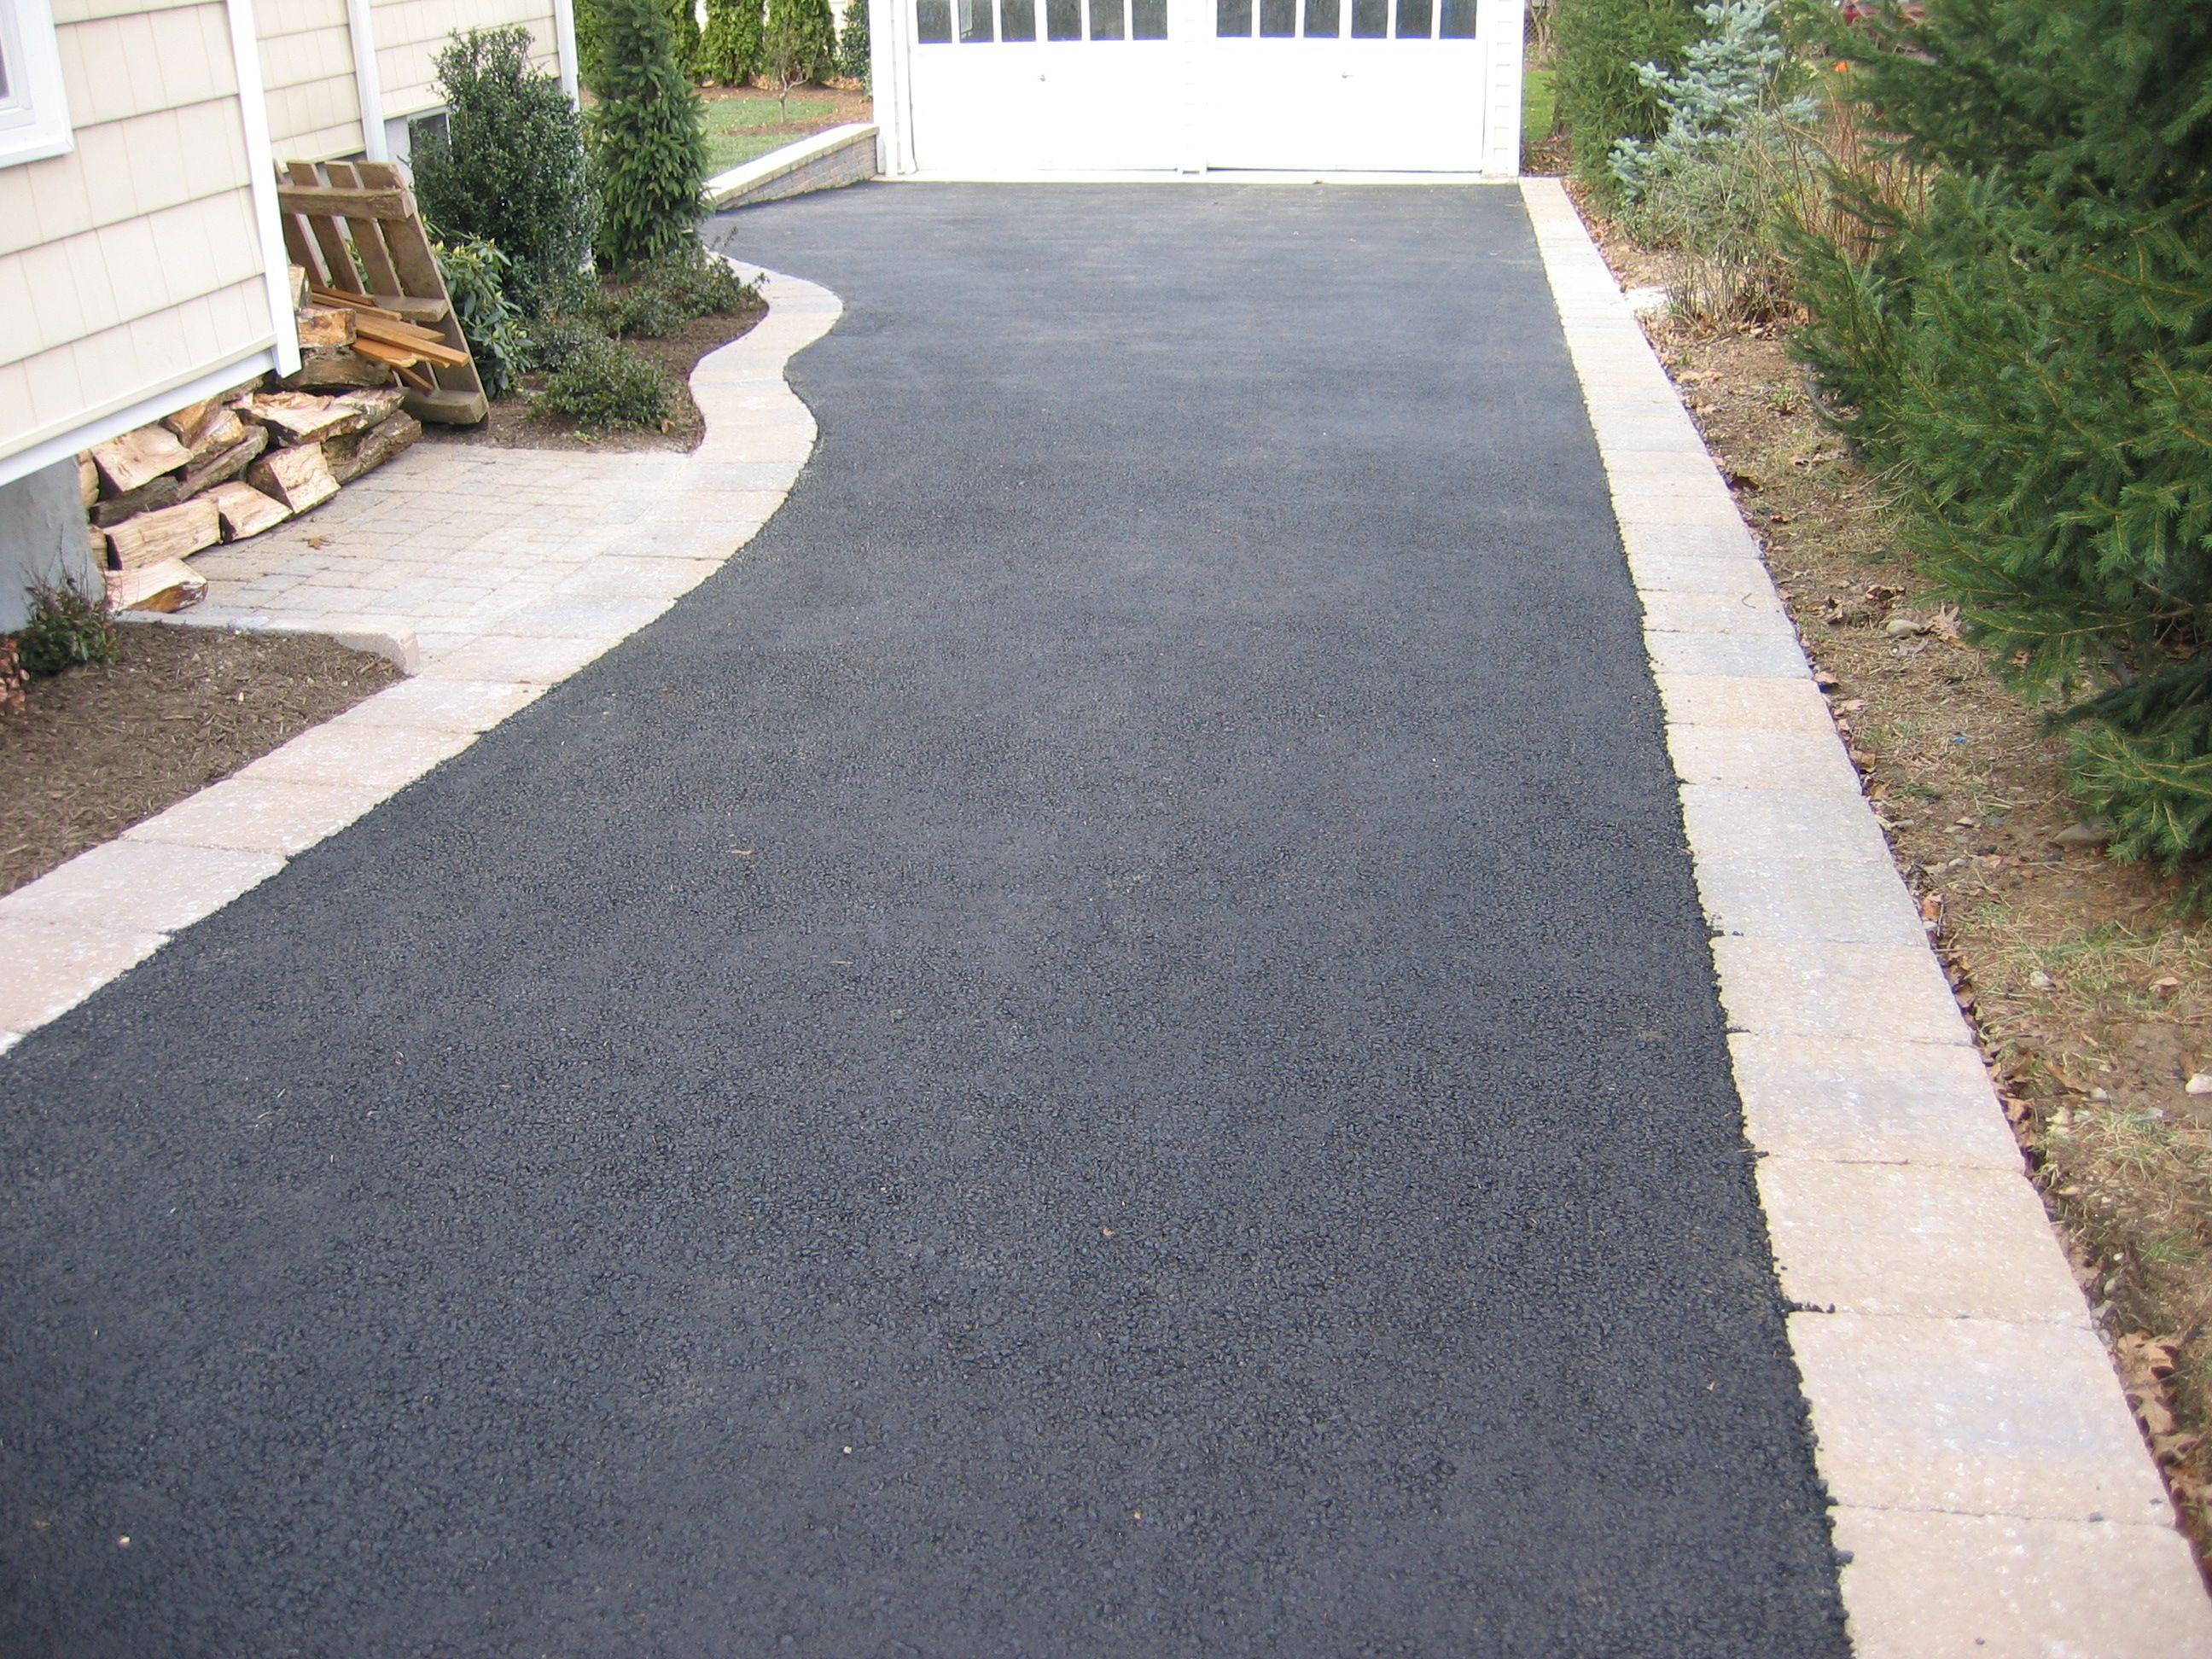 Asphalt driveway and brick paver | Home Renos | Pinterest ...